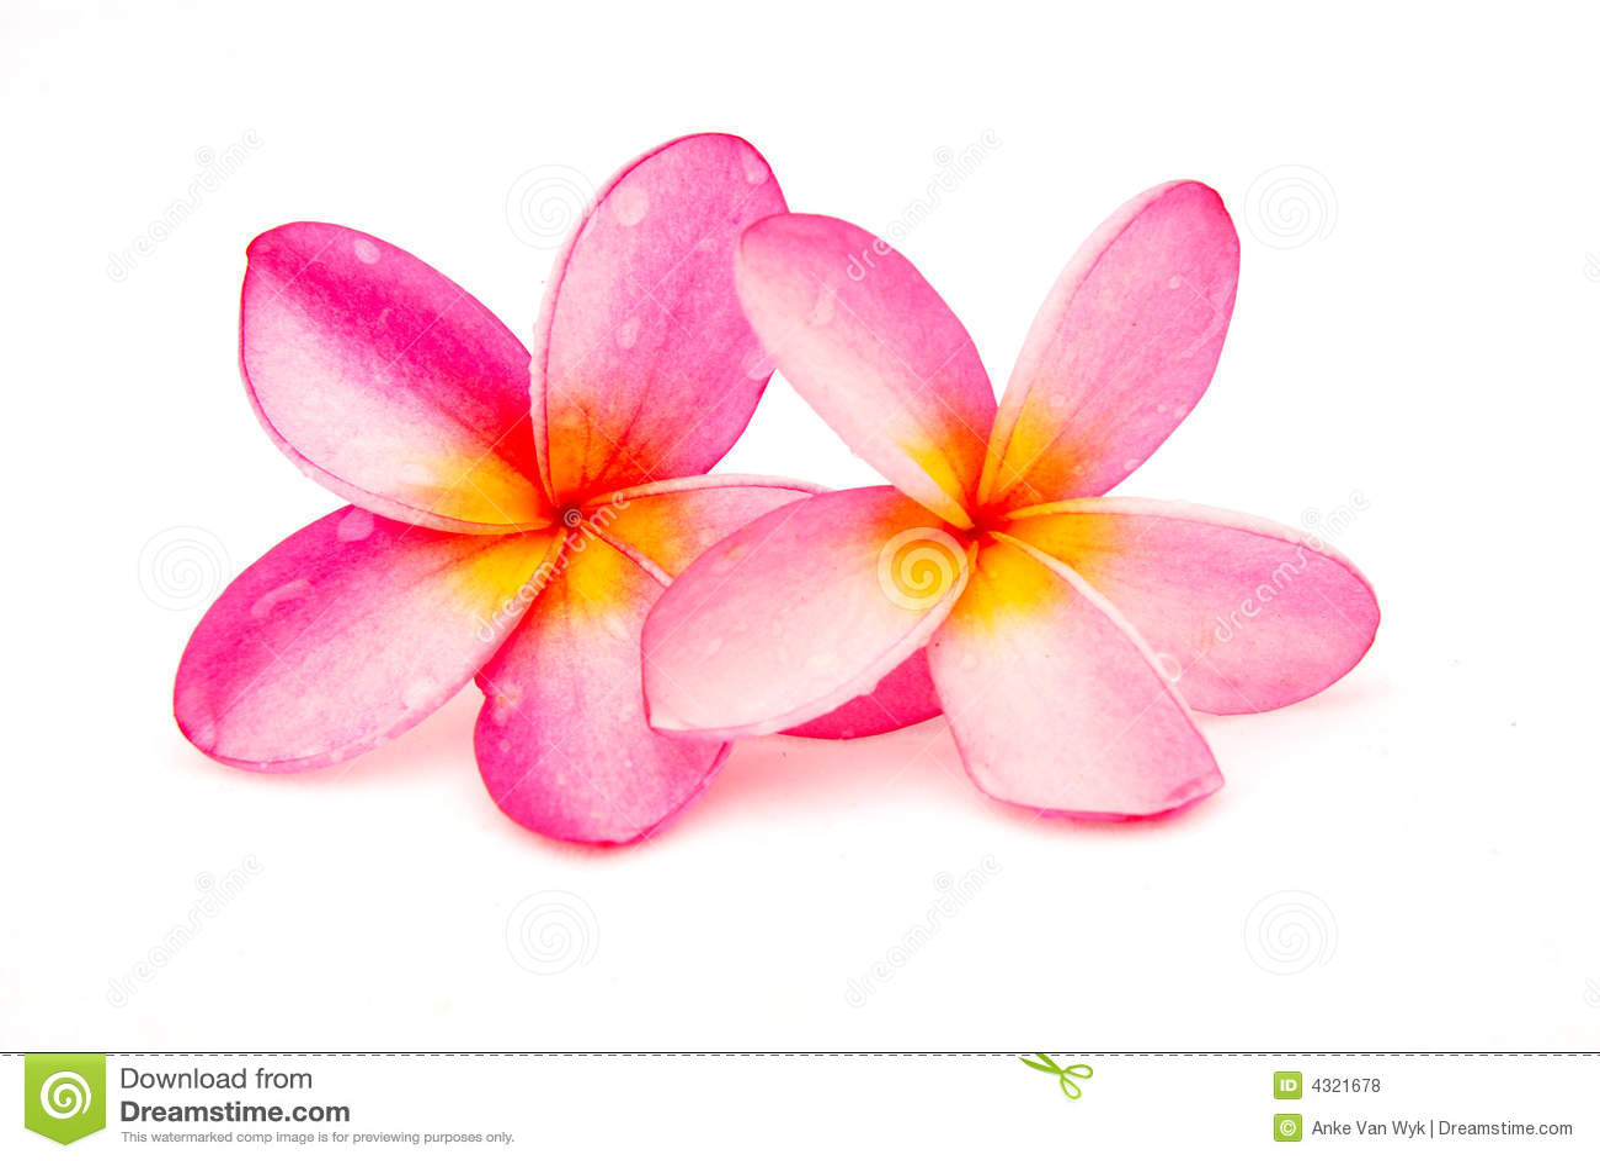 Frangipani spa flowers stock photo image 14654190 - Background Beautiful Blossoms Flower Frangipani